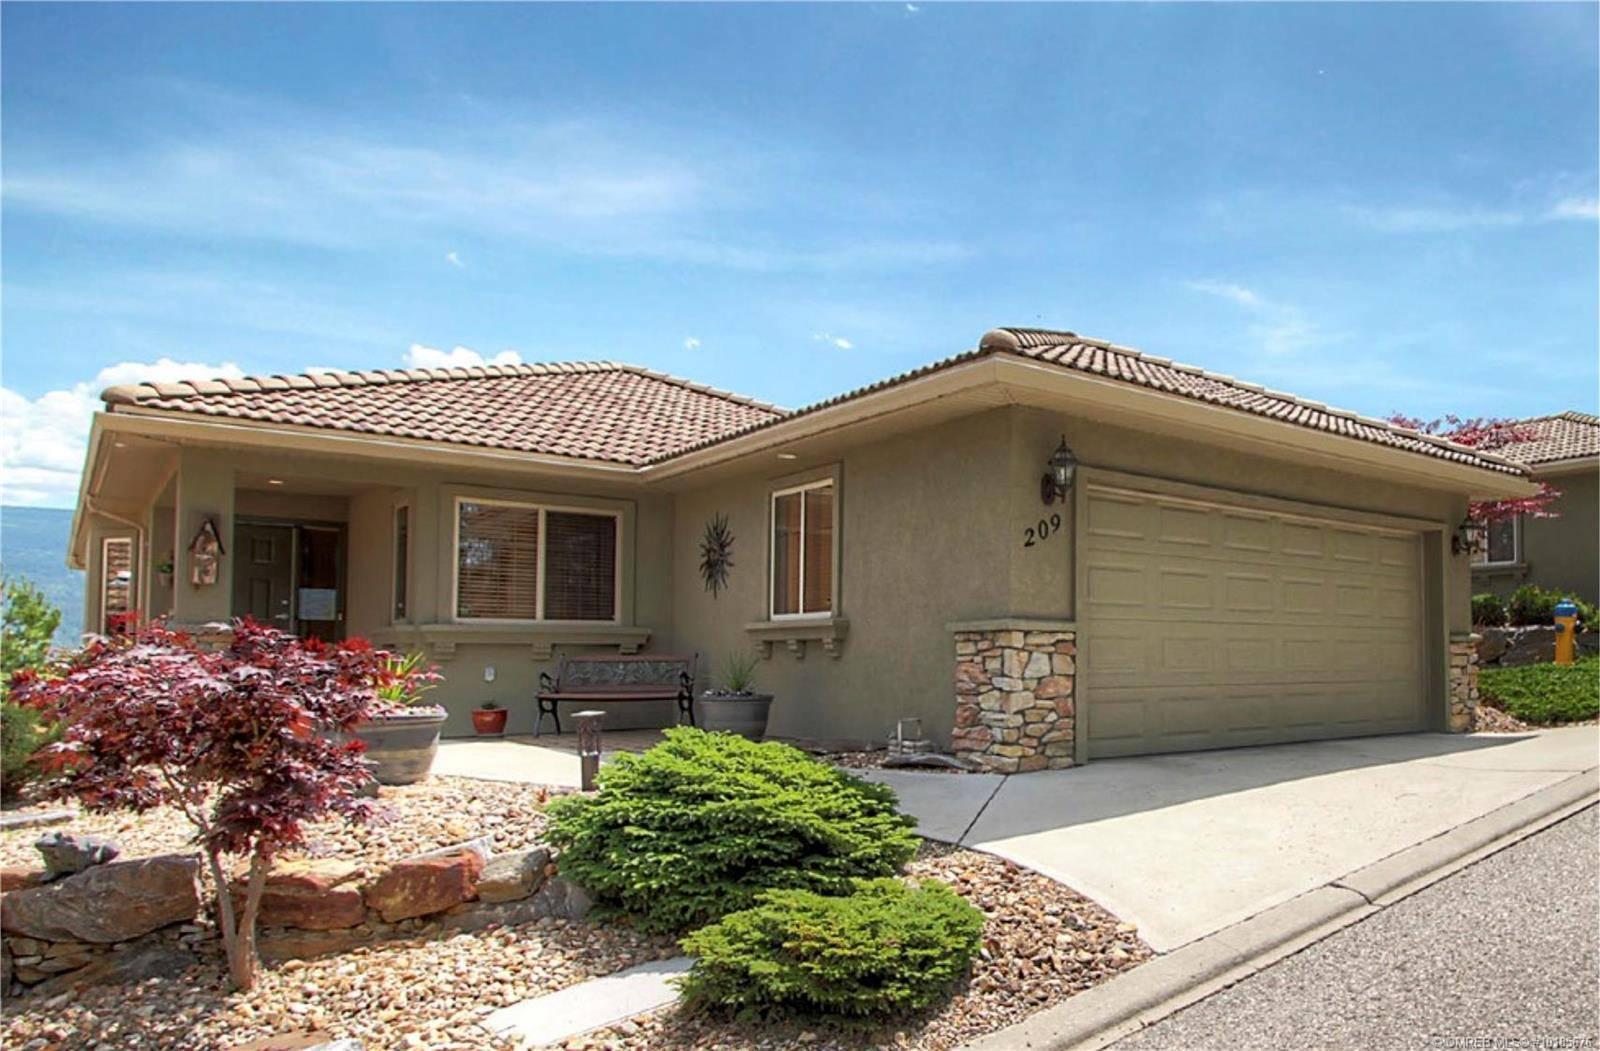 Townhouse for sale at 2455 Quail Ridge Blvd Unit 209 Kelowna British Columbia - MLS: 10185676